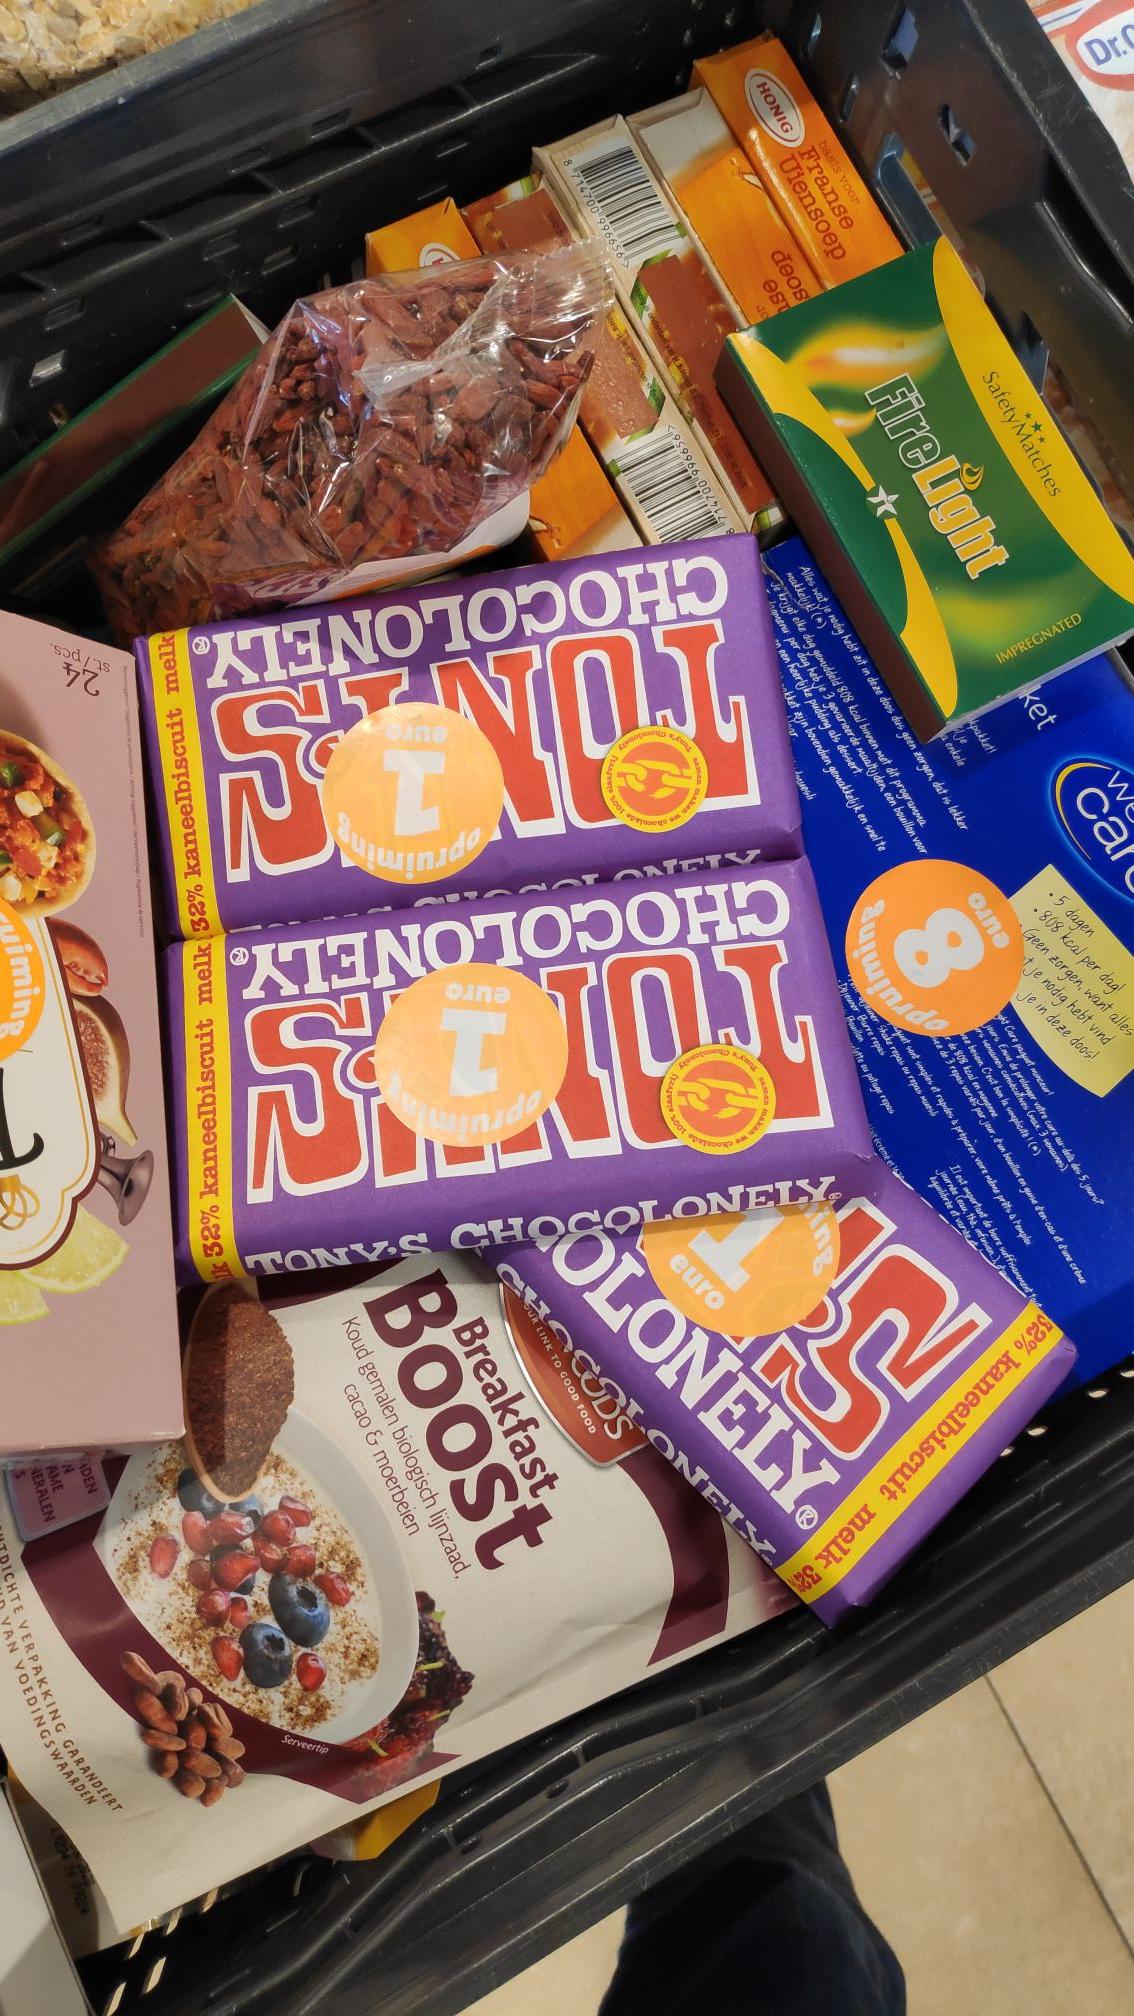 [lokaal] Tony's Chocolonely €1 @Jumbo Sportlaan Gouda